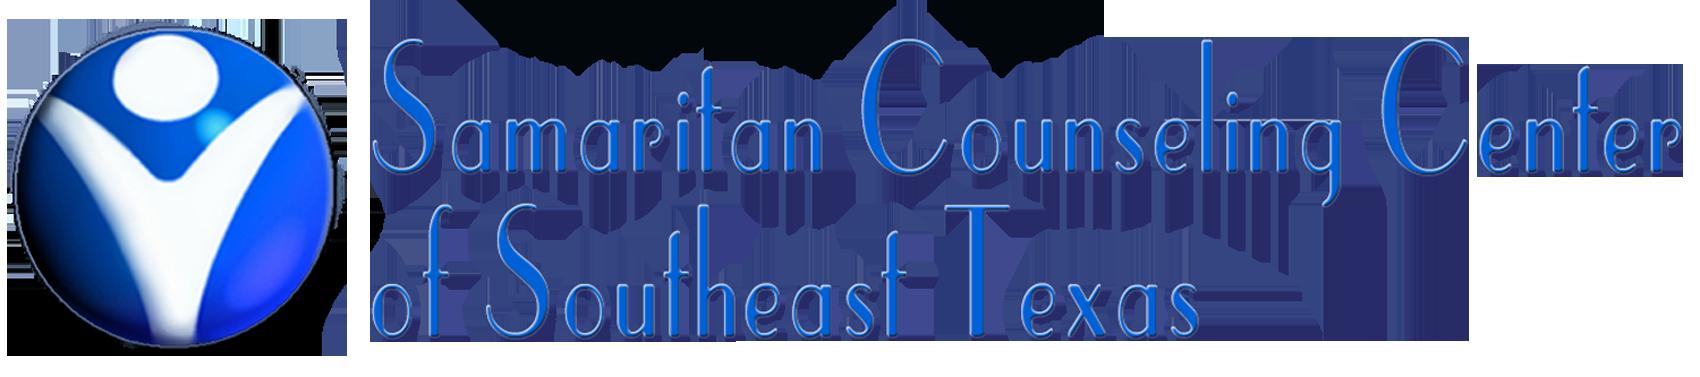 Samaritan Counseling Center of Southeast Texas Logo